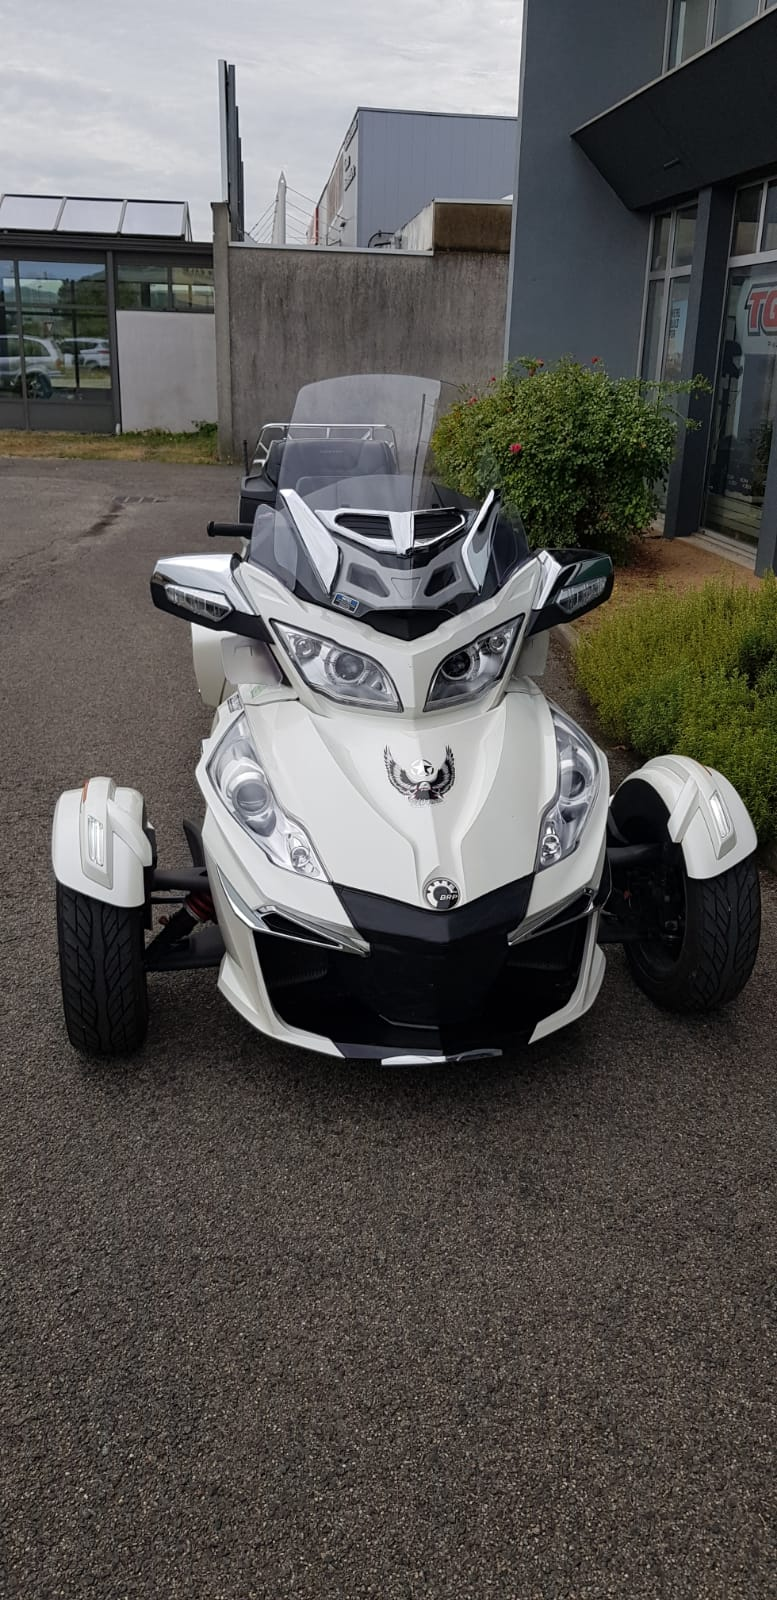 Le Can-Am Spyder RT évolue en 2020 Img-2010